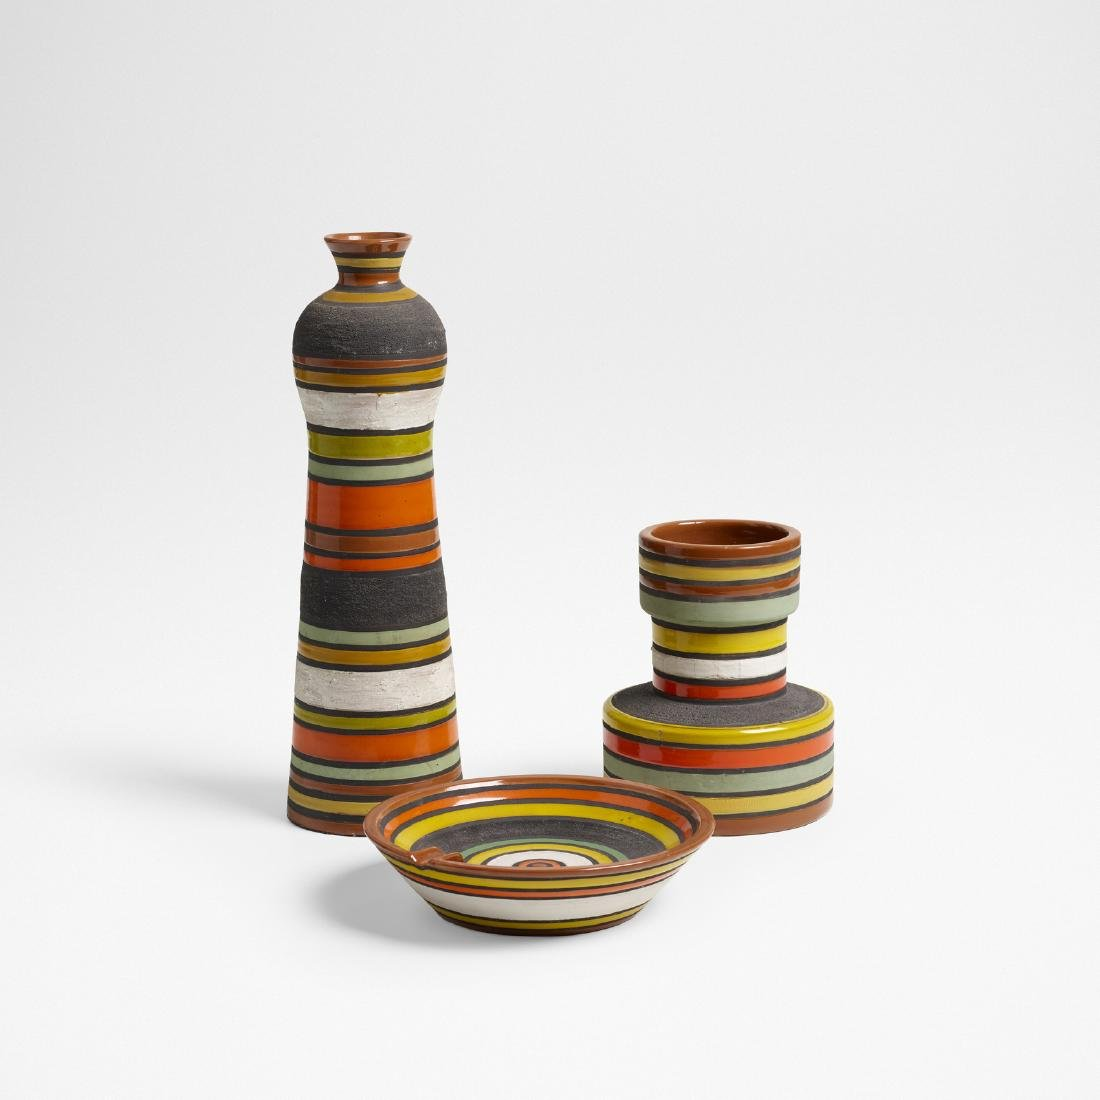 Aldo Londi, Thailandia vessels, collection of three